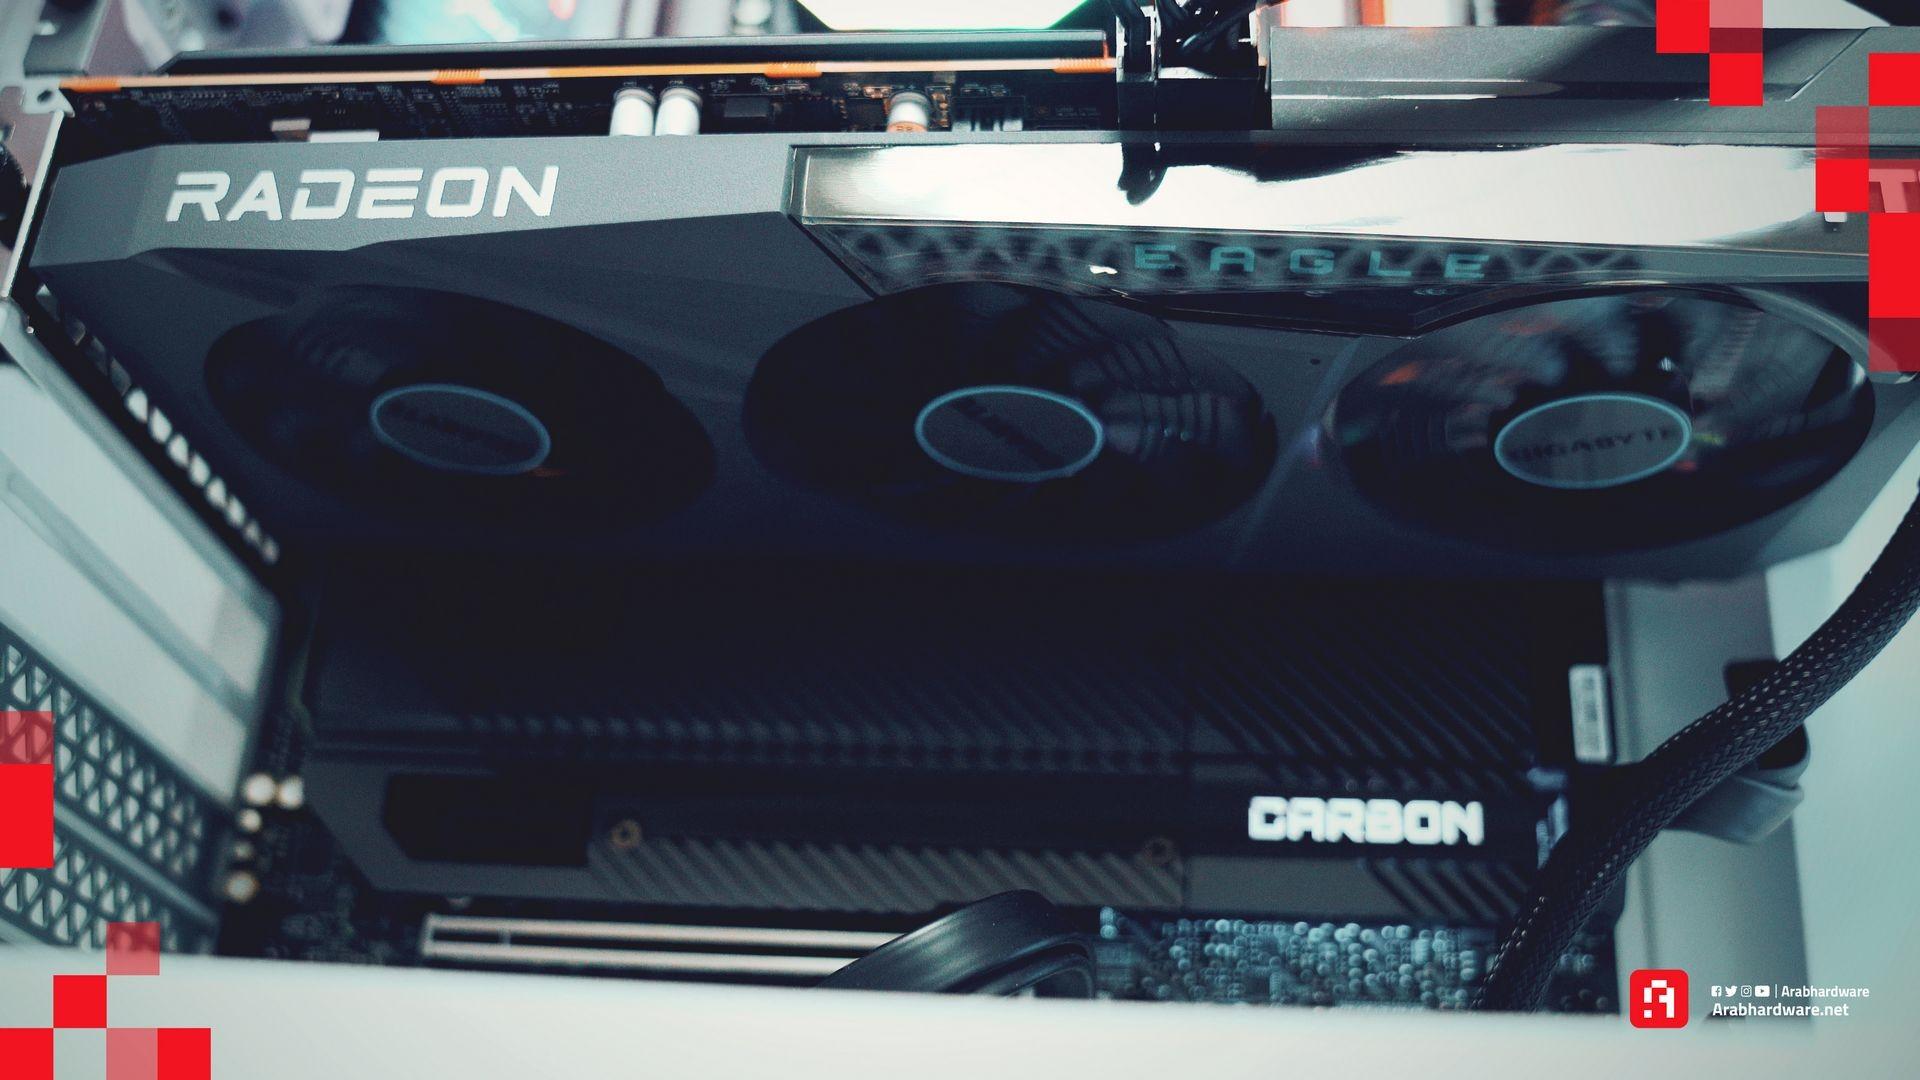 Radeon RX 6600 EAGLE